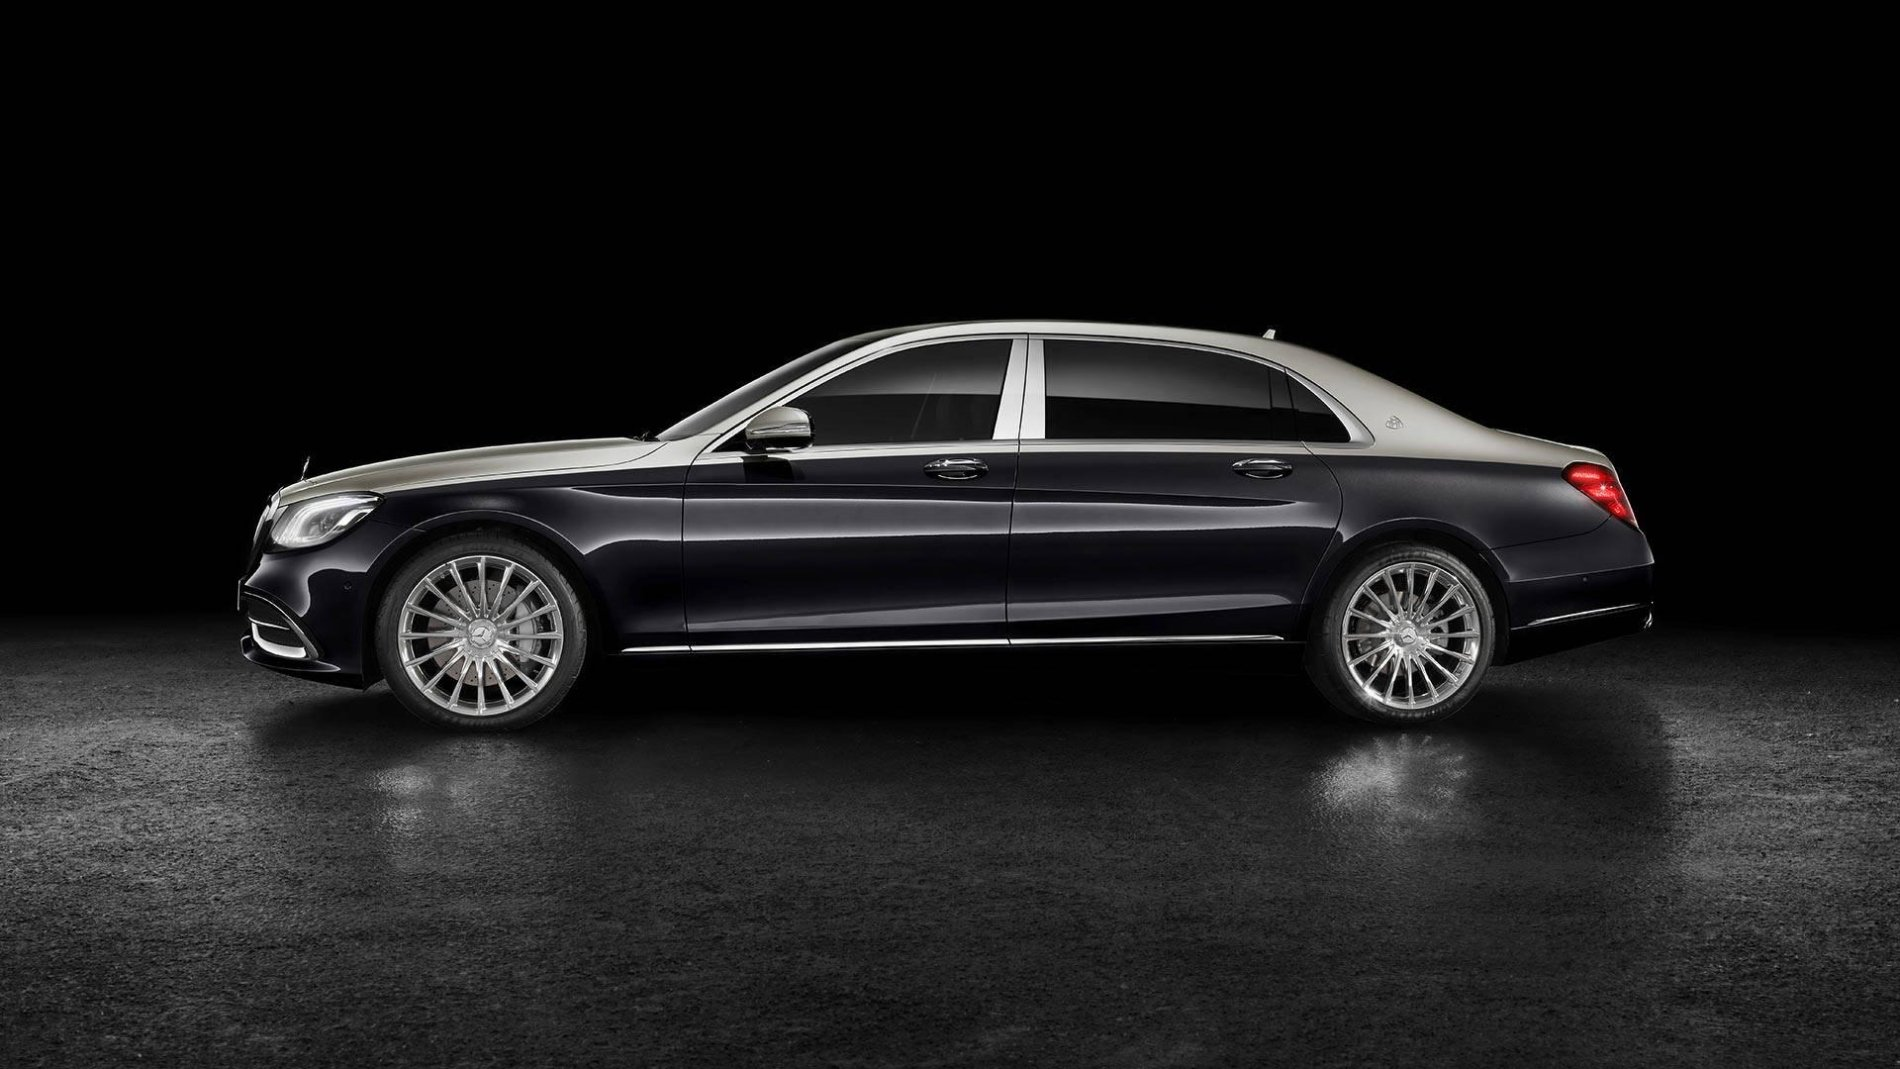 Mercedes-Maybach S-Class facelift - Mercedes-Maybach S-Class facelift